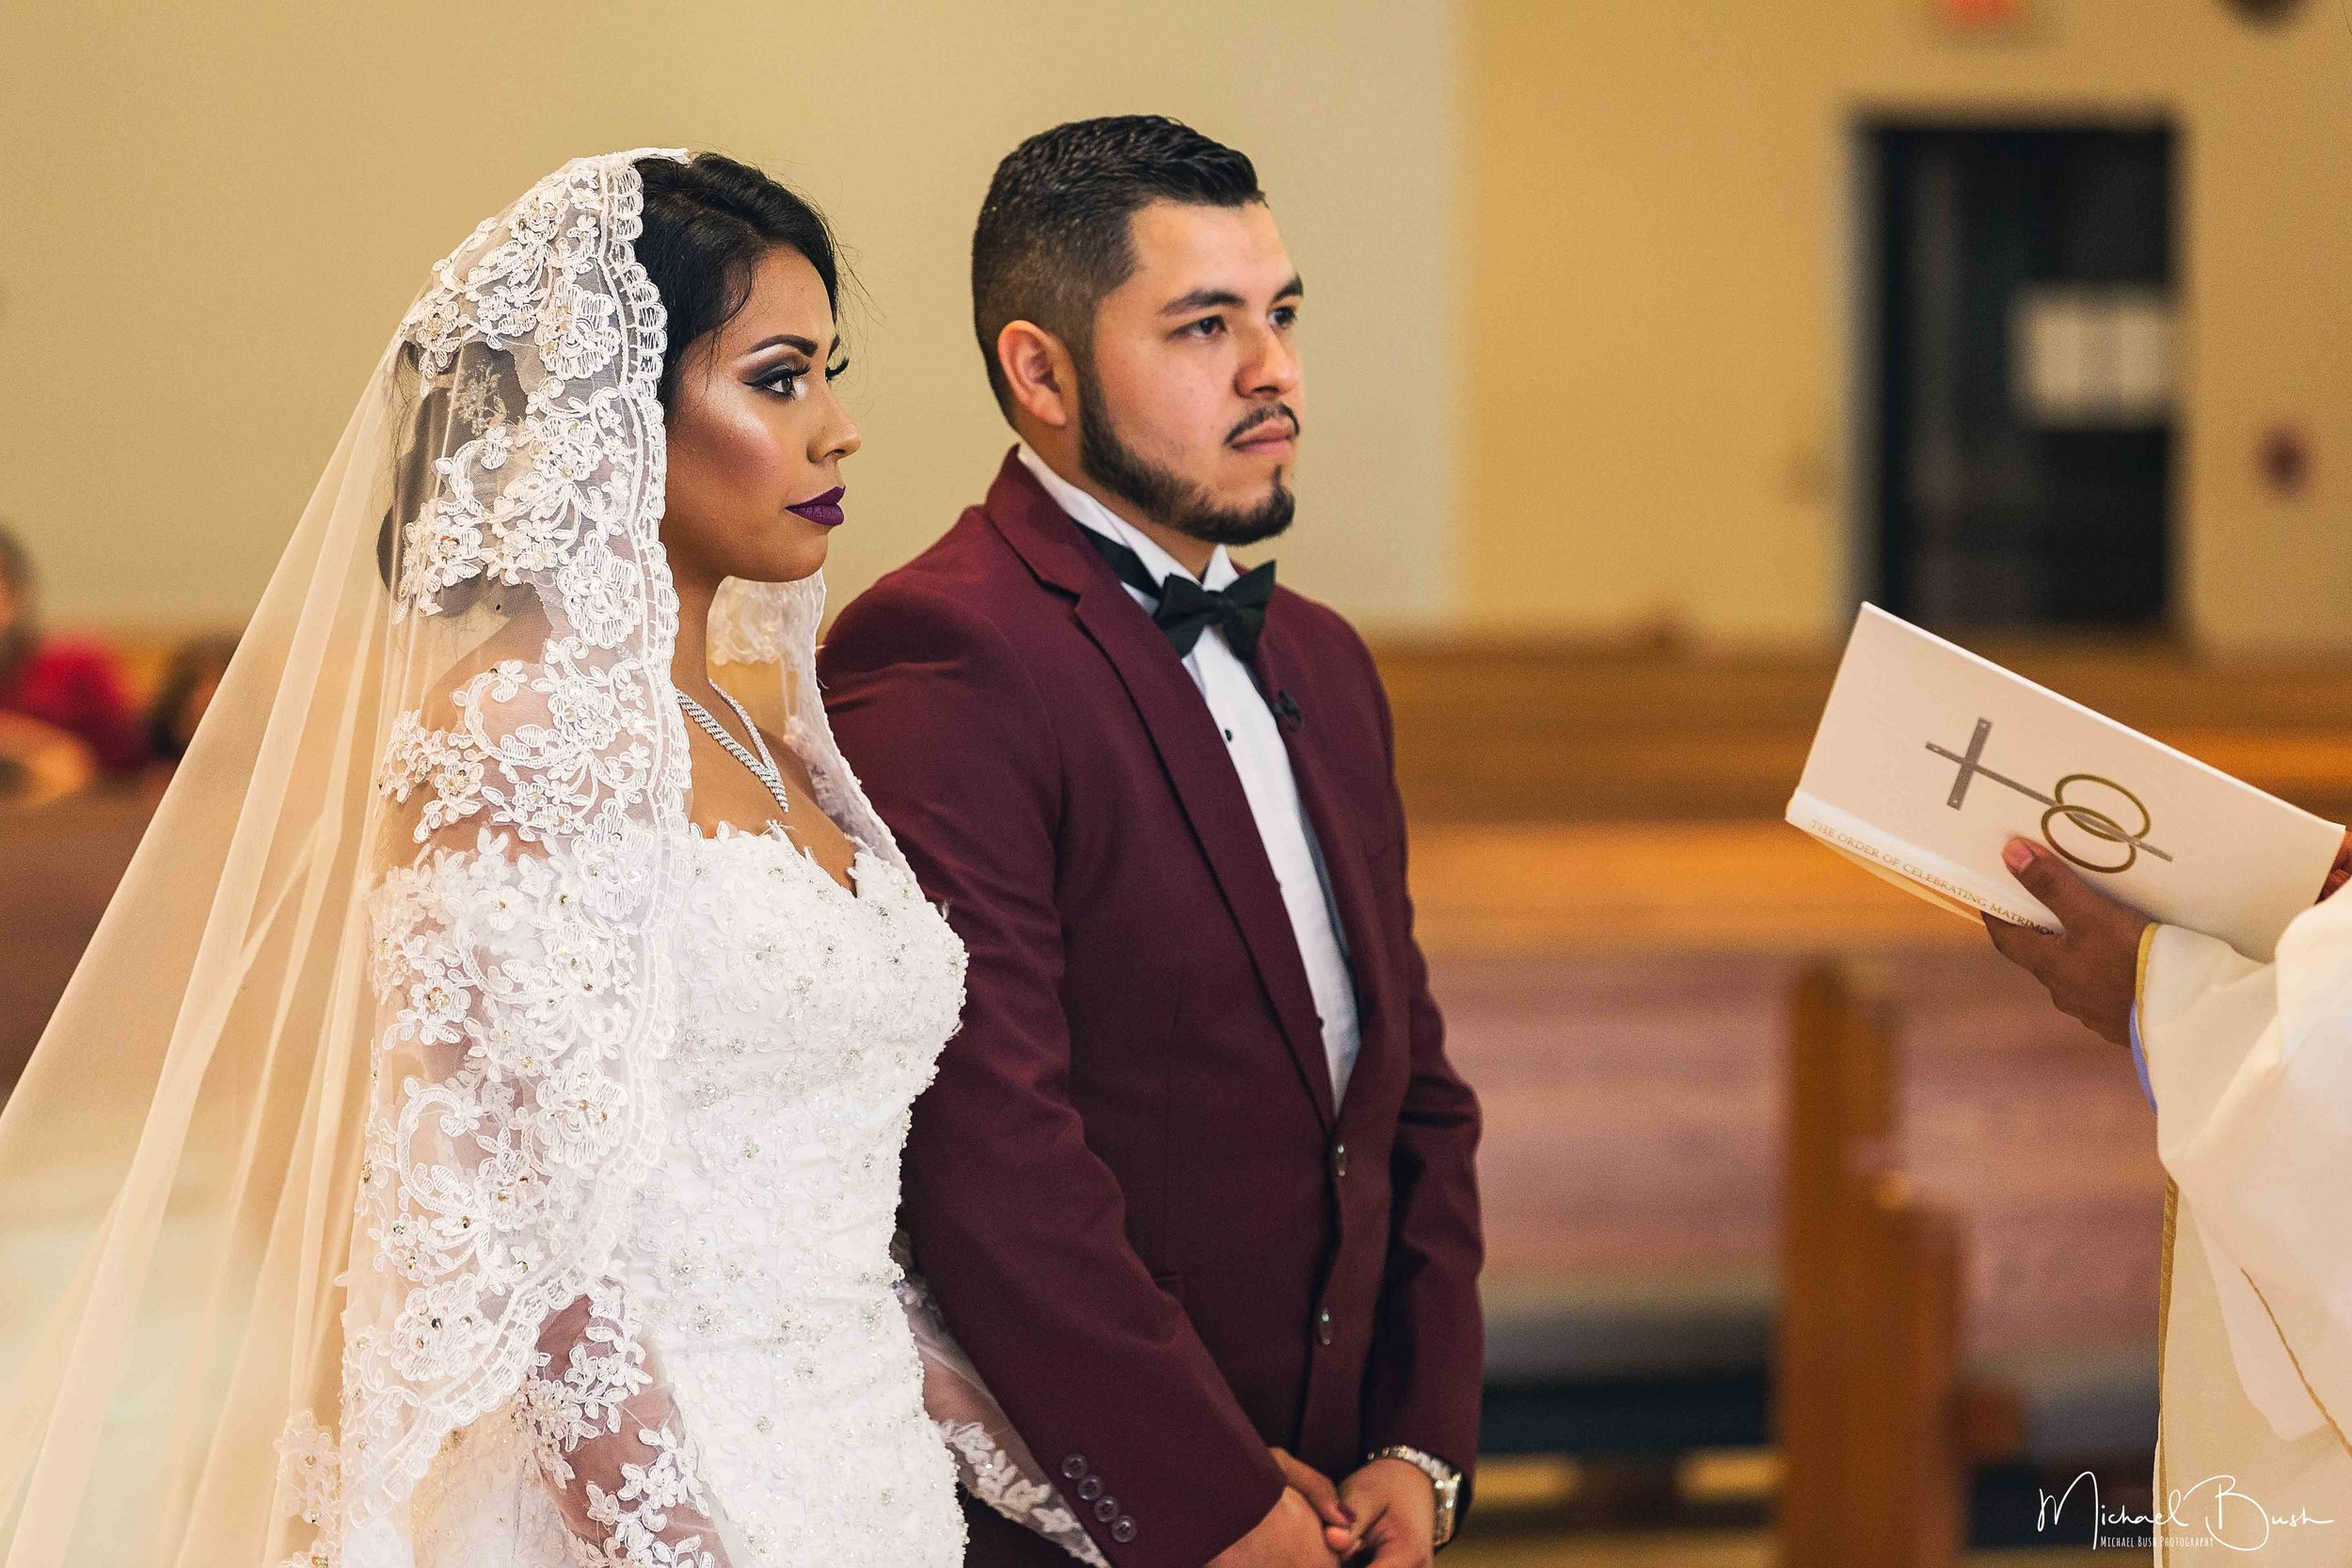 Wedding-Details-Bride-Fort Worth-colors-Ceremony-weddingceremony-brides-groom-ido-church-guadalupe.jpg